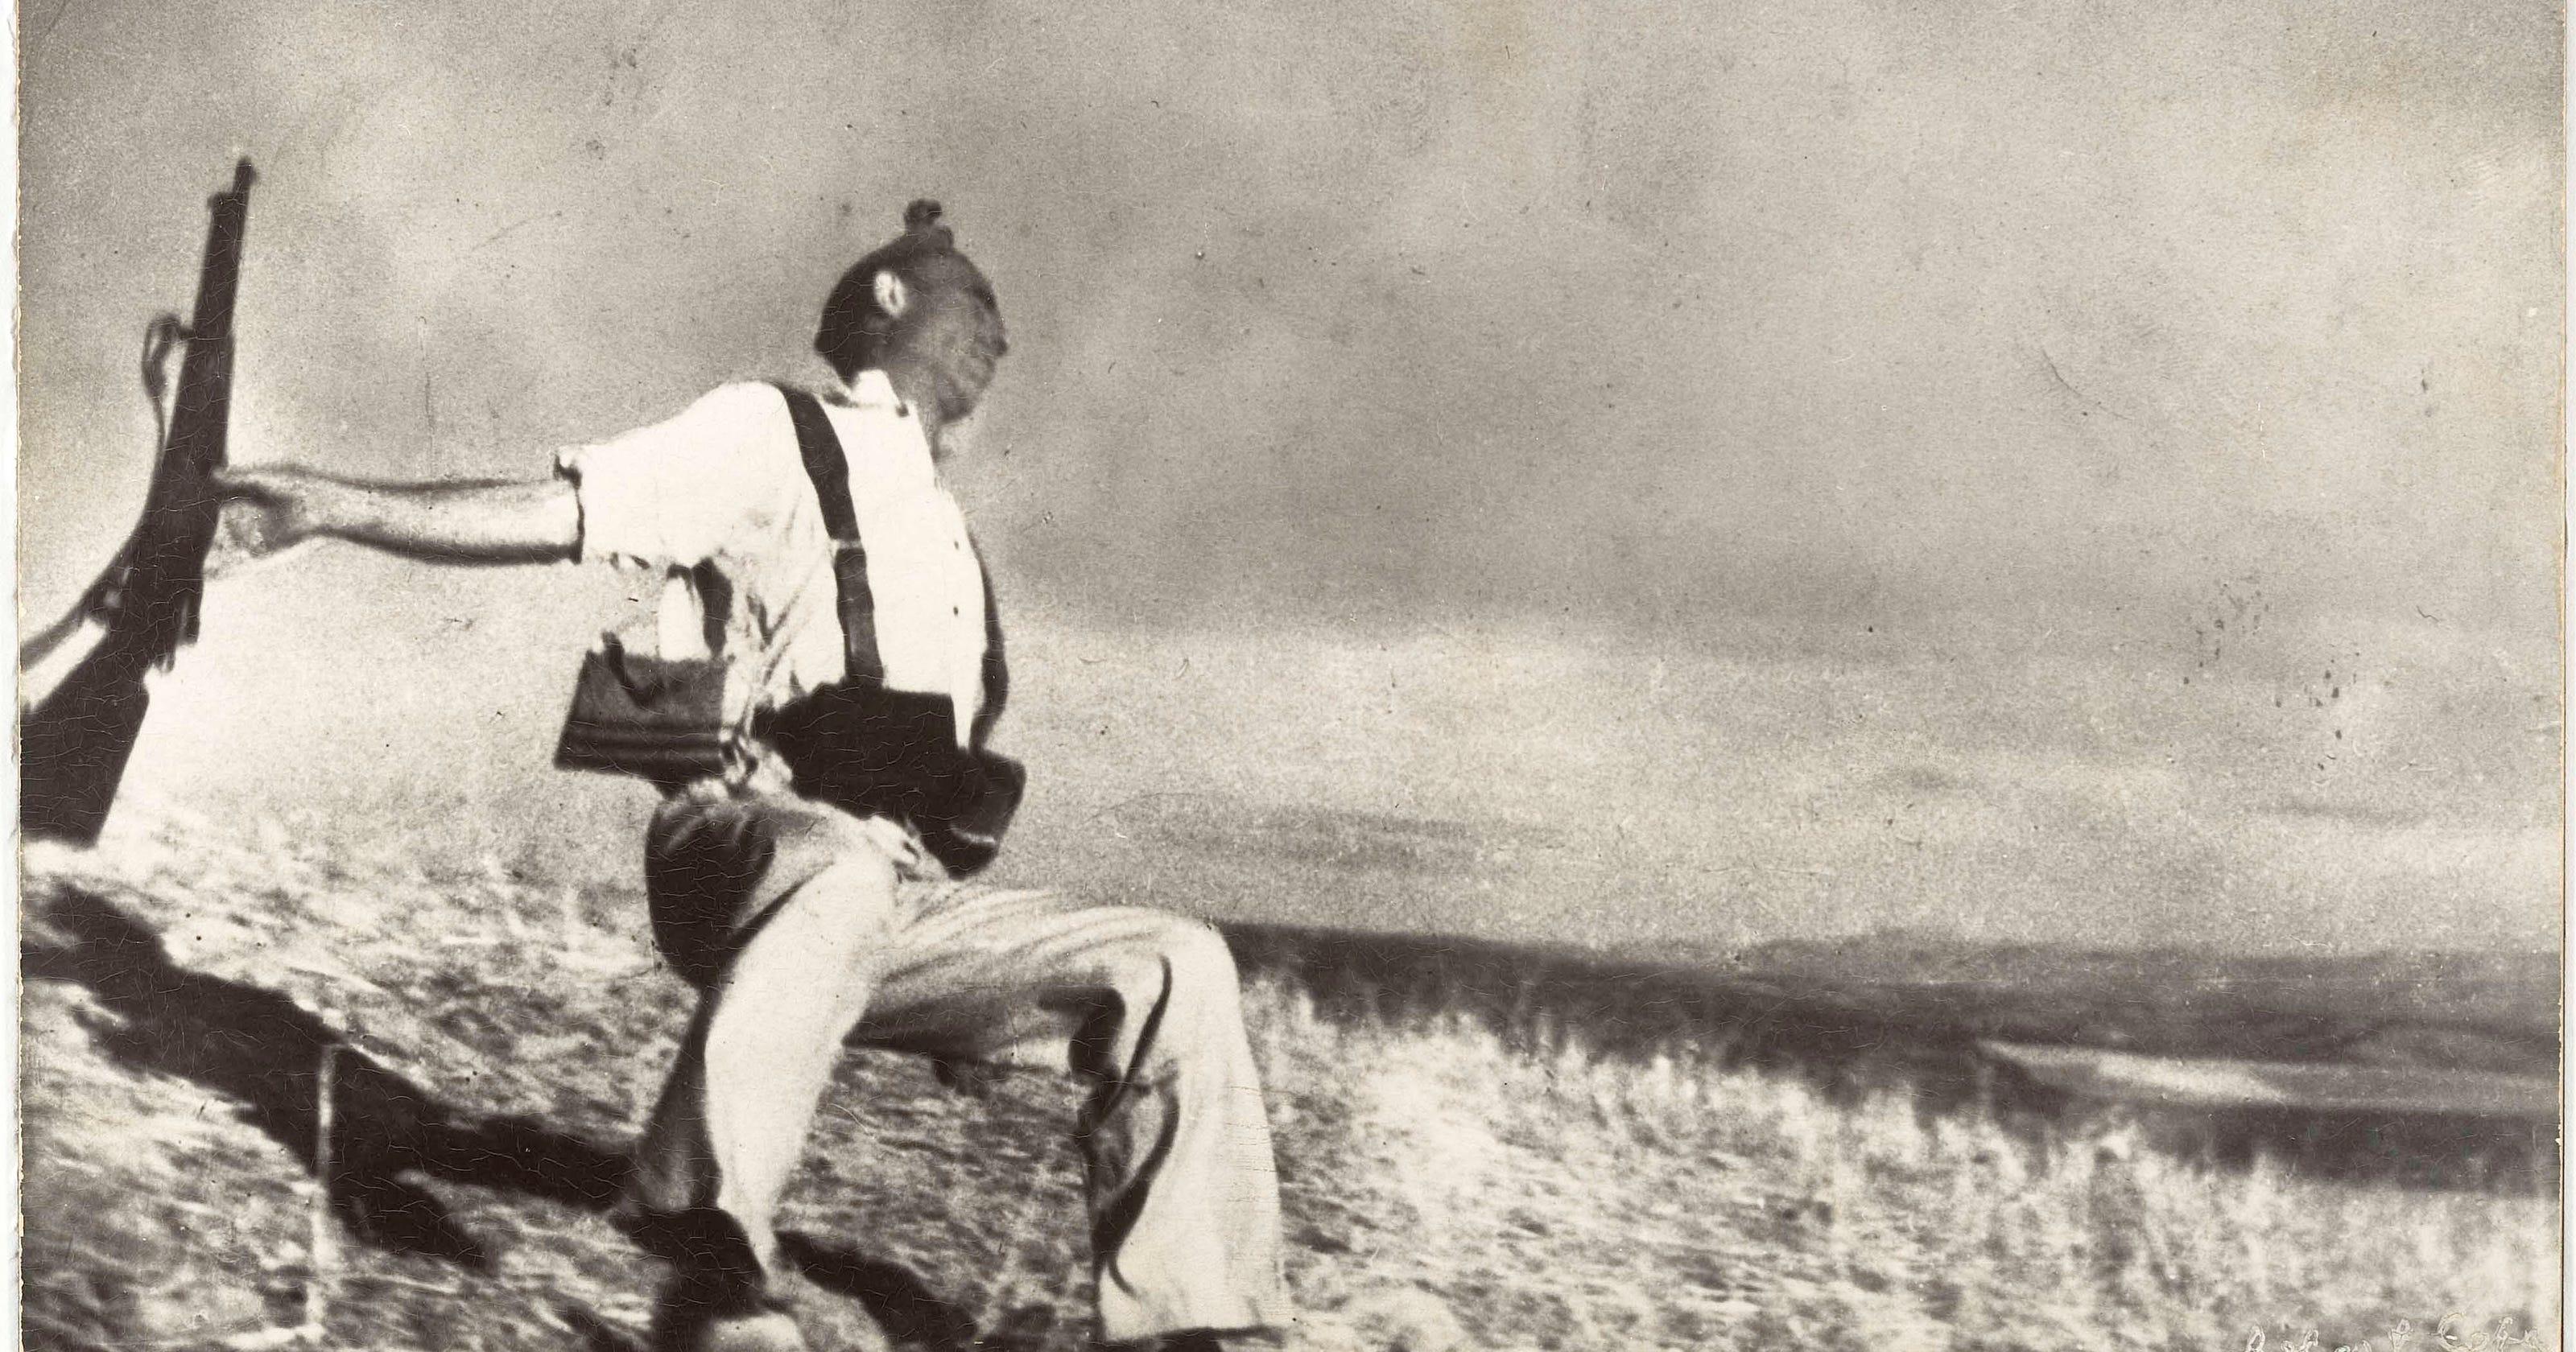 The Falling Soldier - Wikipedia Robert capa fake photo